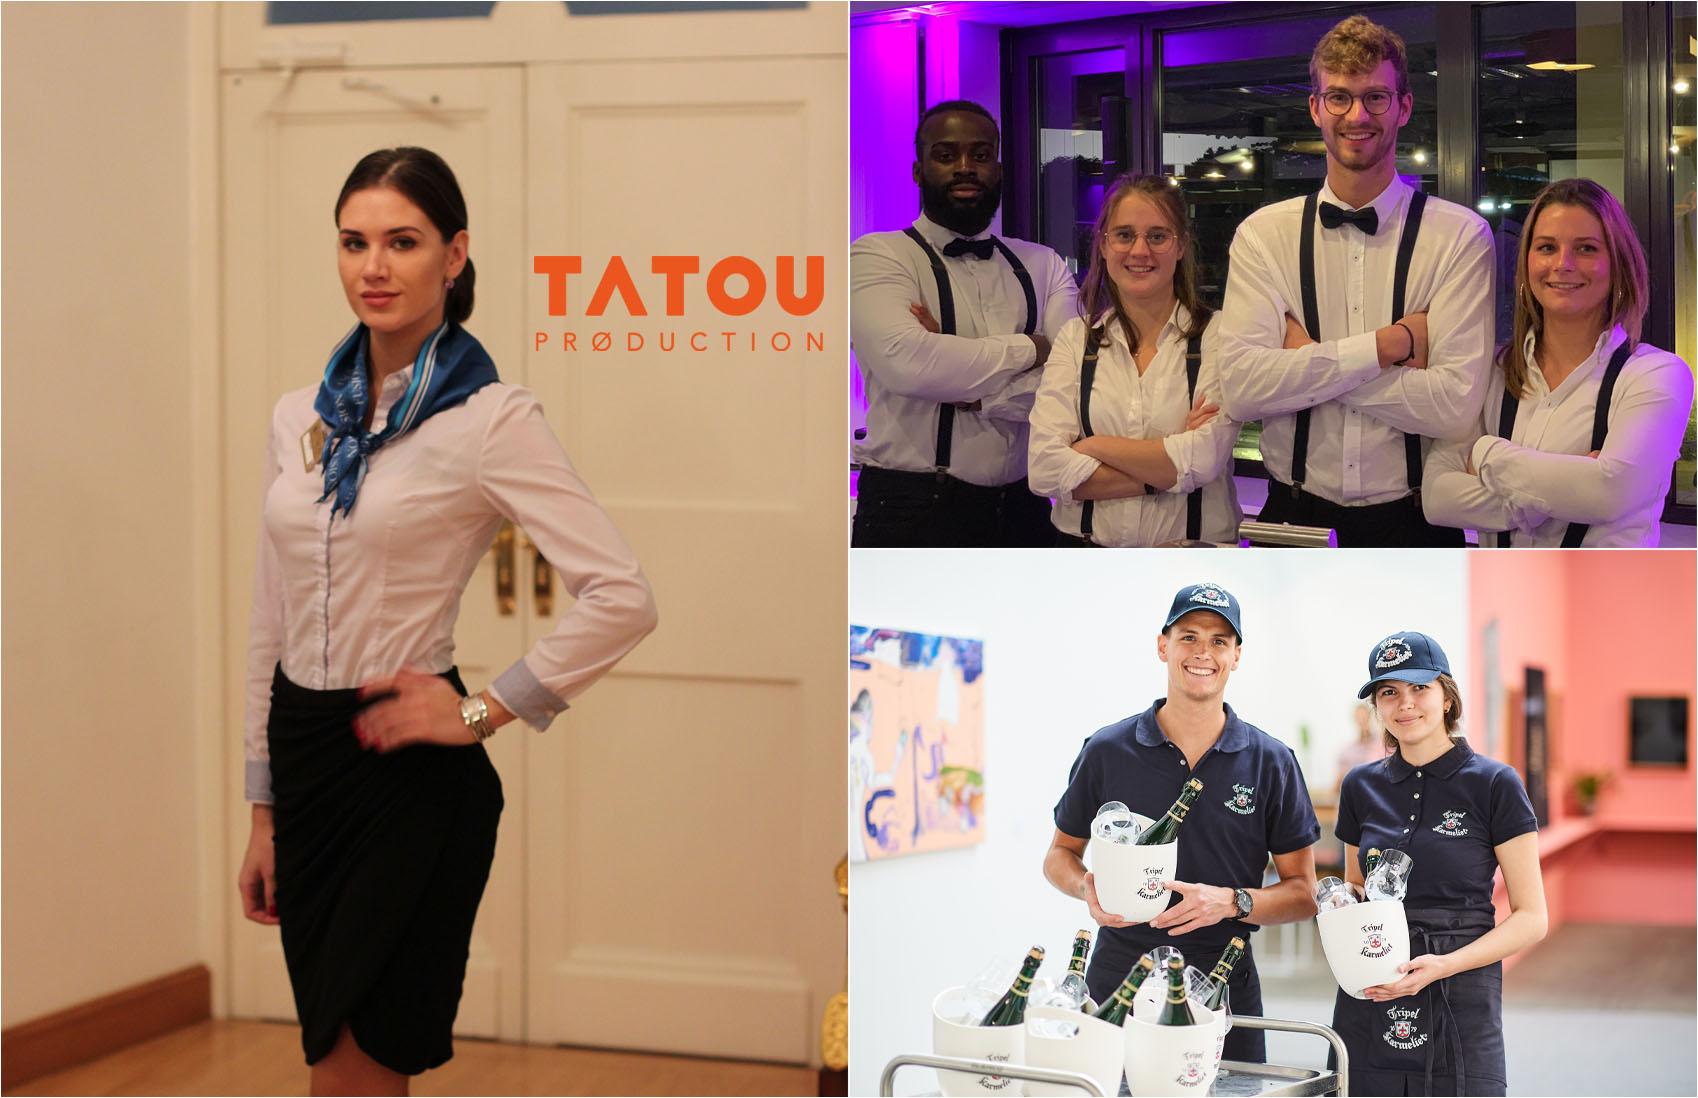 kwakoo-event-publication-news-tatou-production